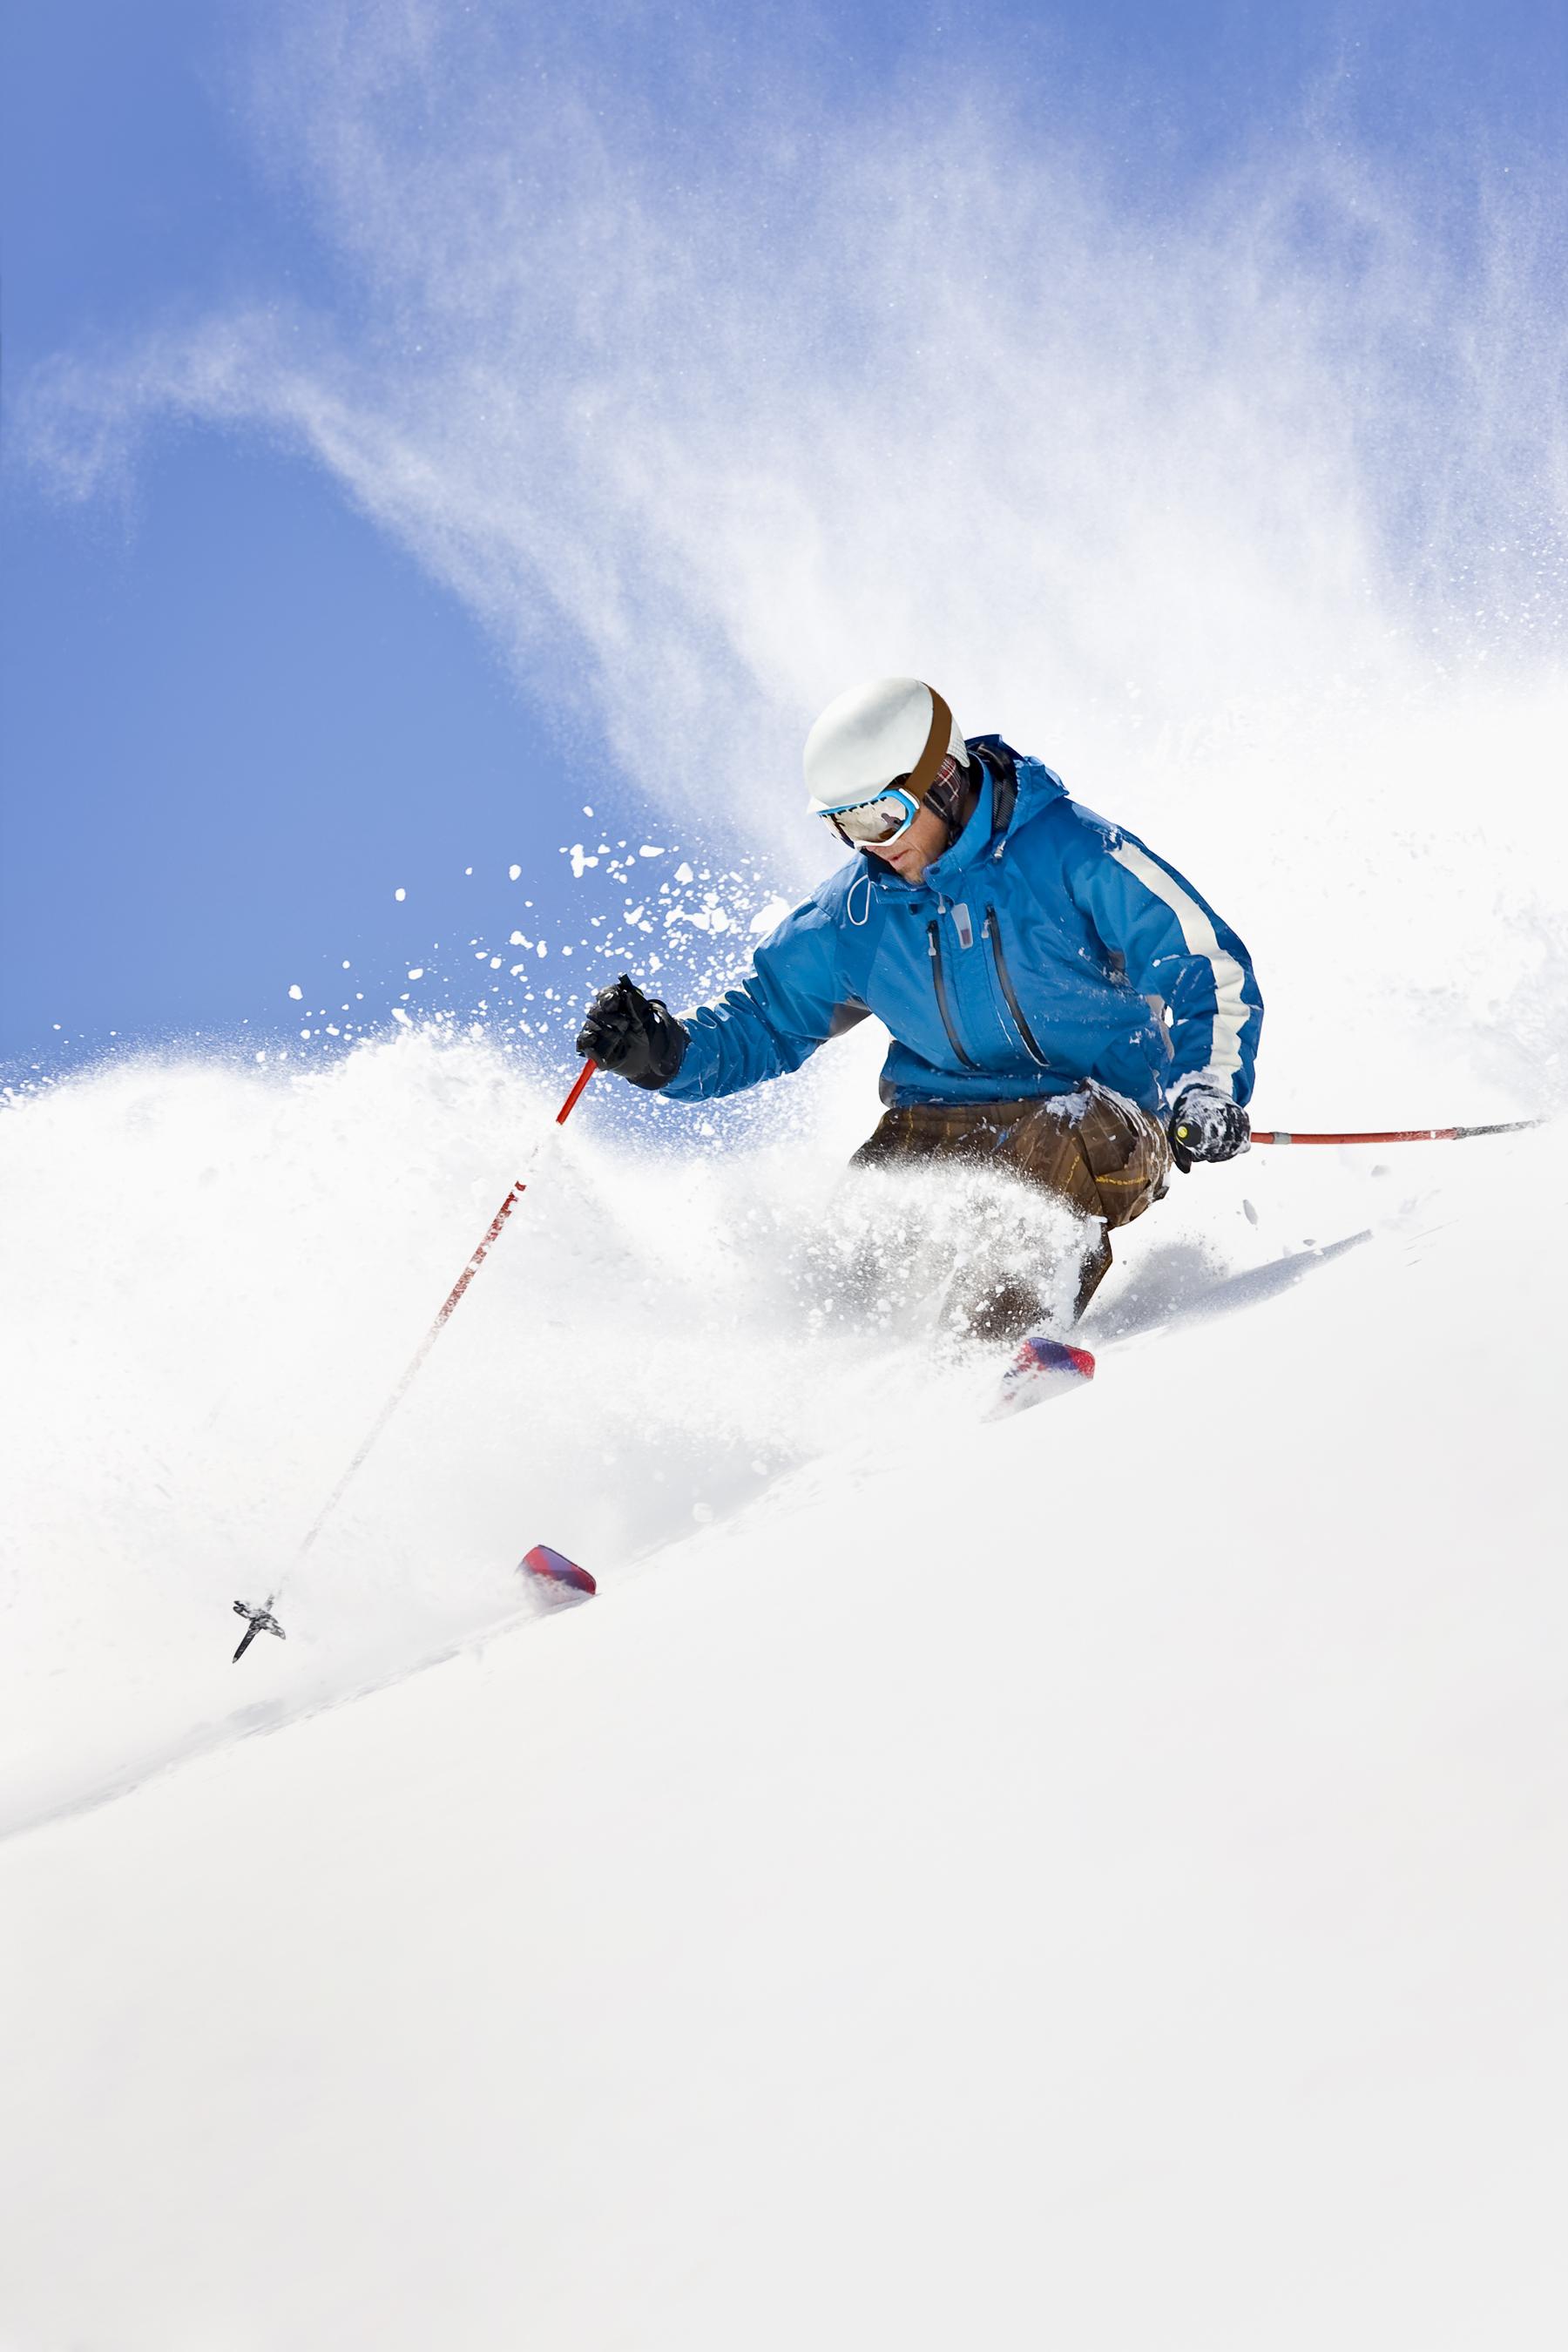 Ski_iStock-154079488.jpg